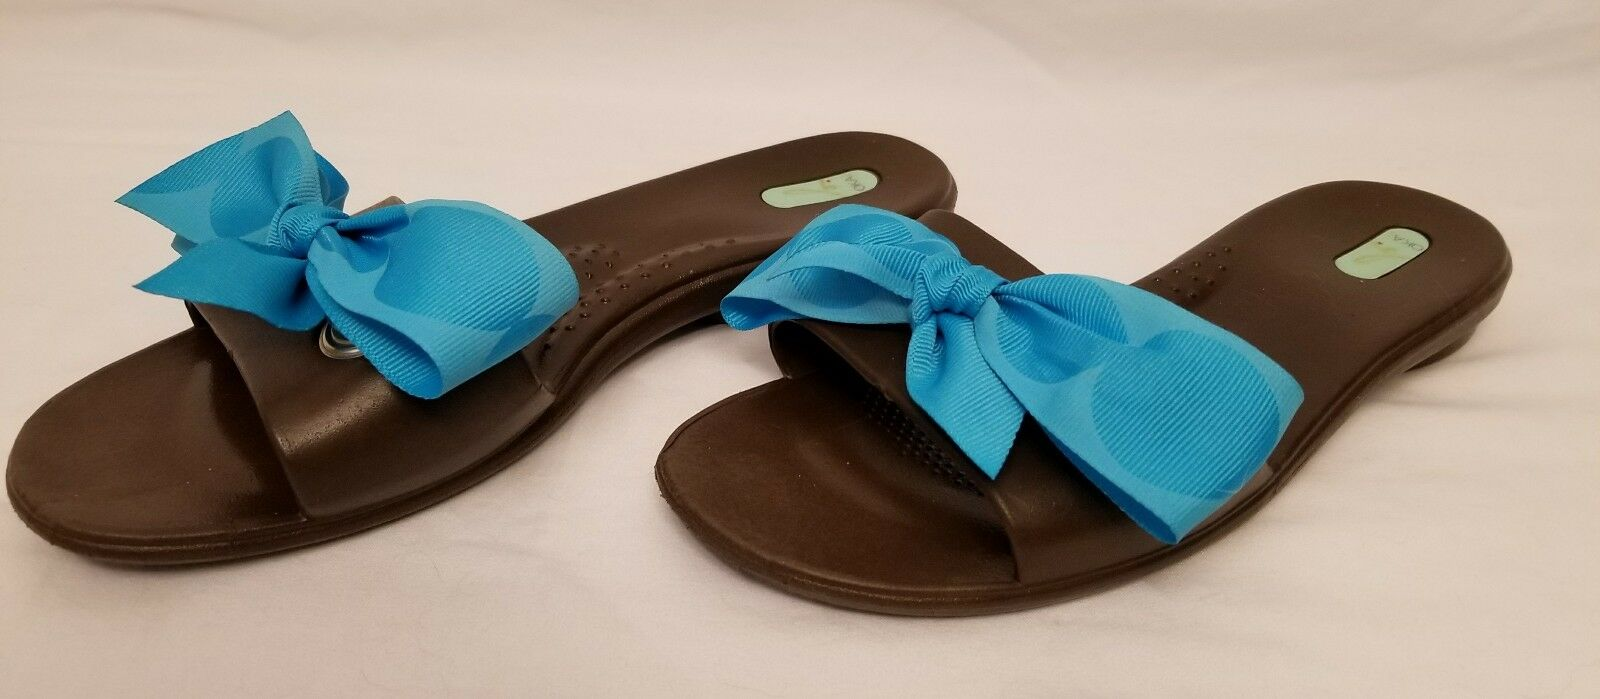 Okabashi Oka Sandals B Womens Brown Slide Sandals Oka W/Blue Bows Size ML Women's 8-9 VGPC bb82ce